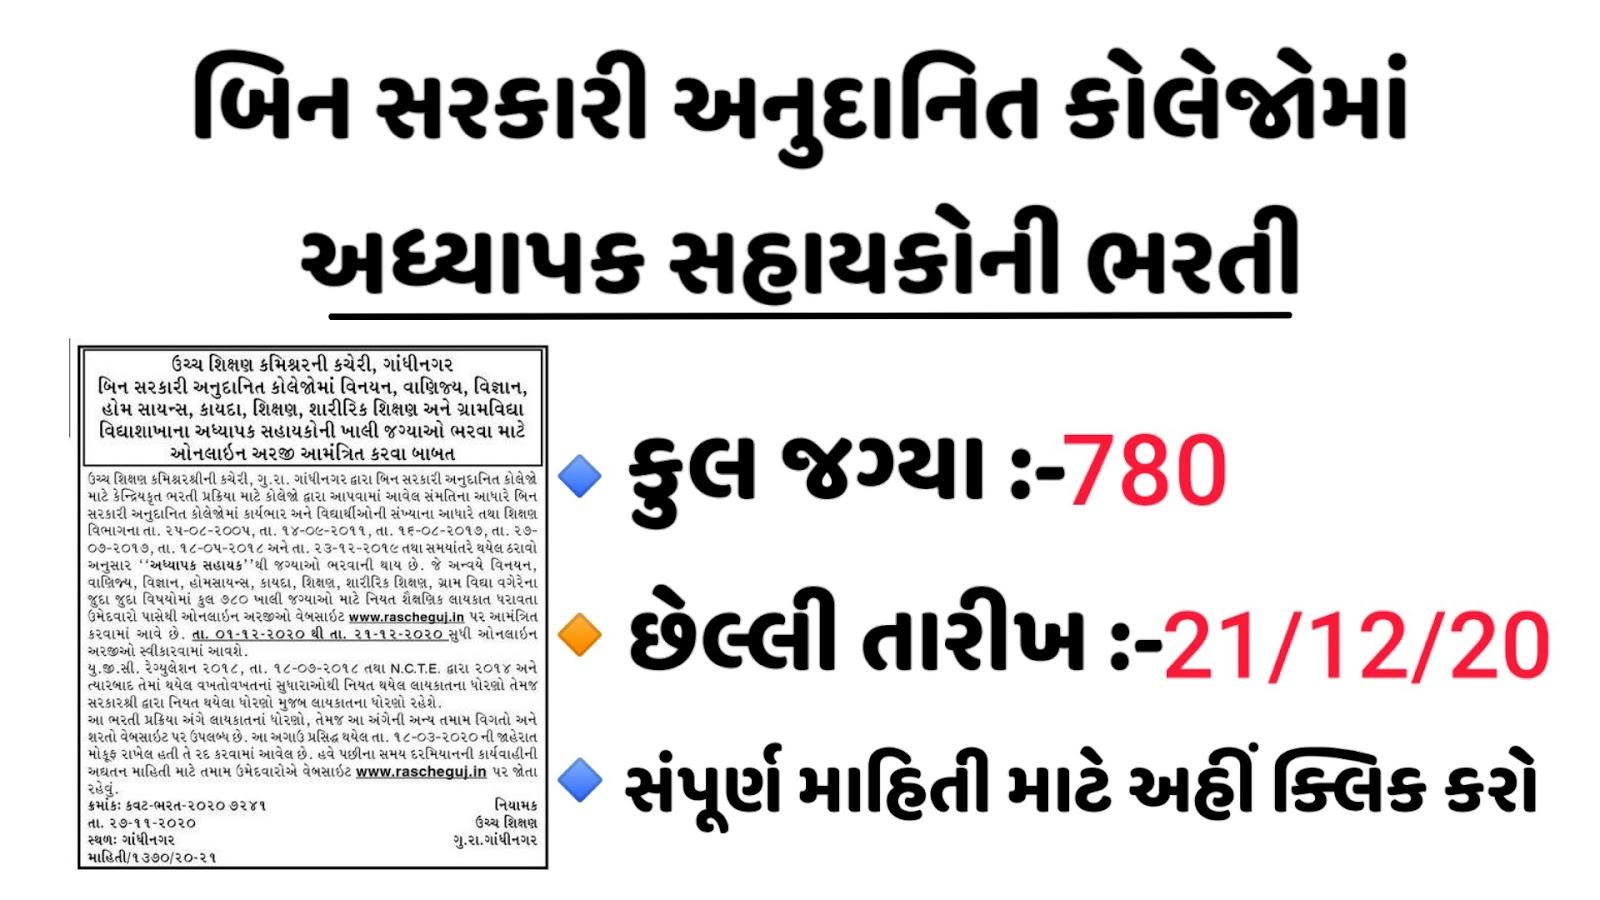 [www.rascheguj.in] Commissionerate of Higher Education, Gujarat Recruitment for Assistant Professor 2020